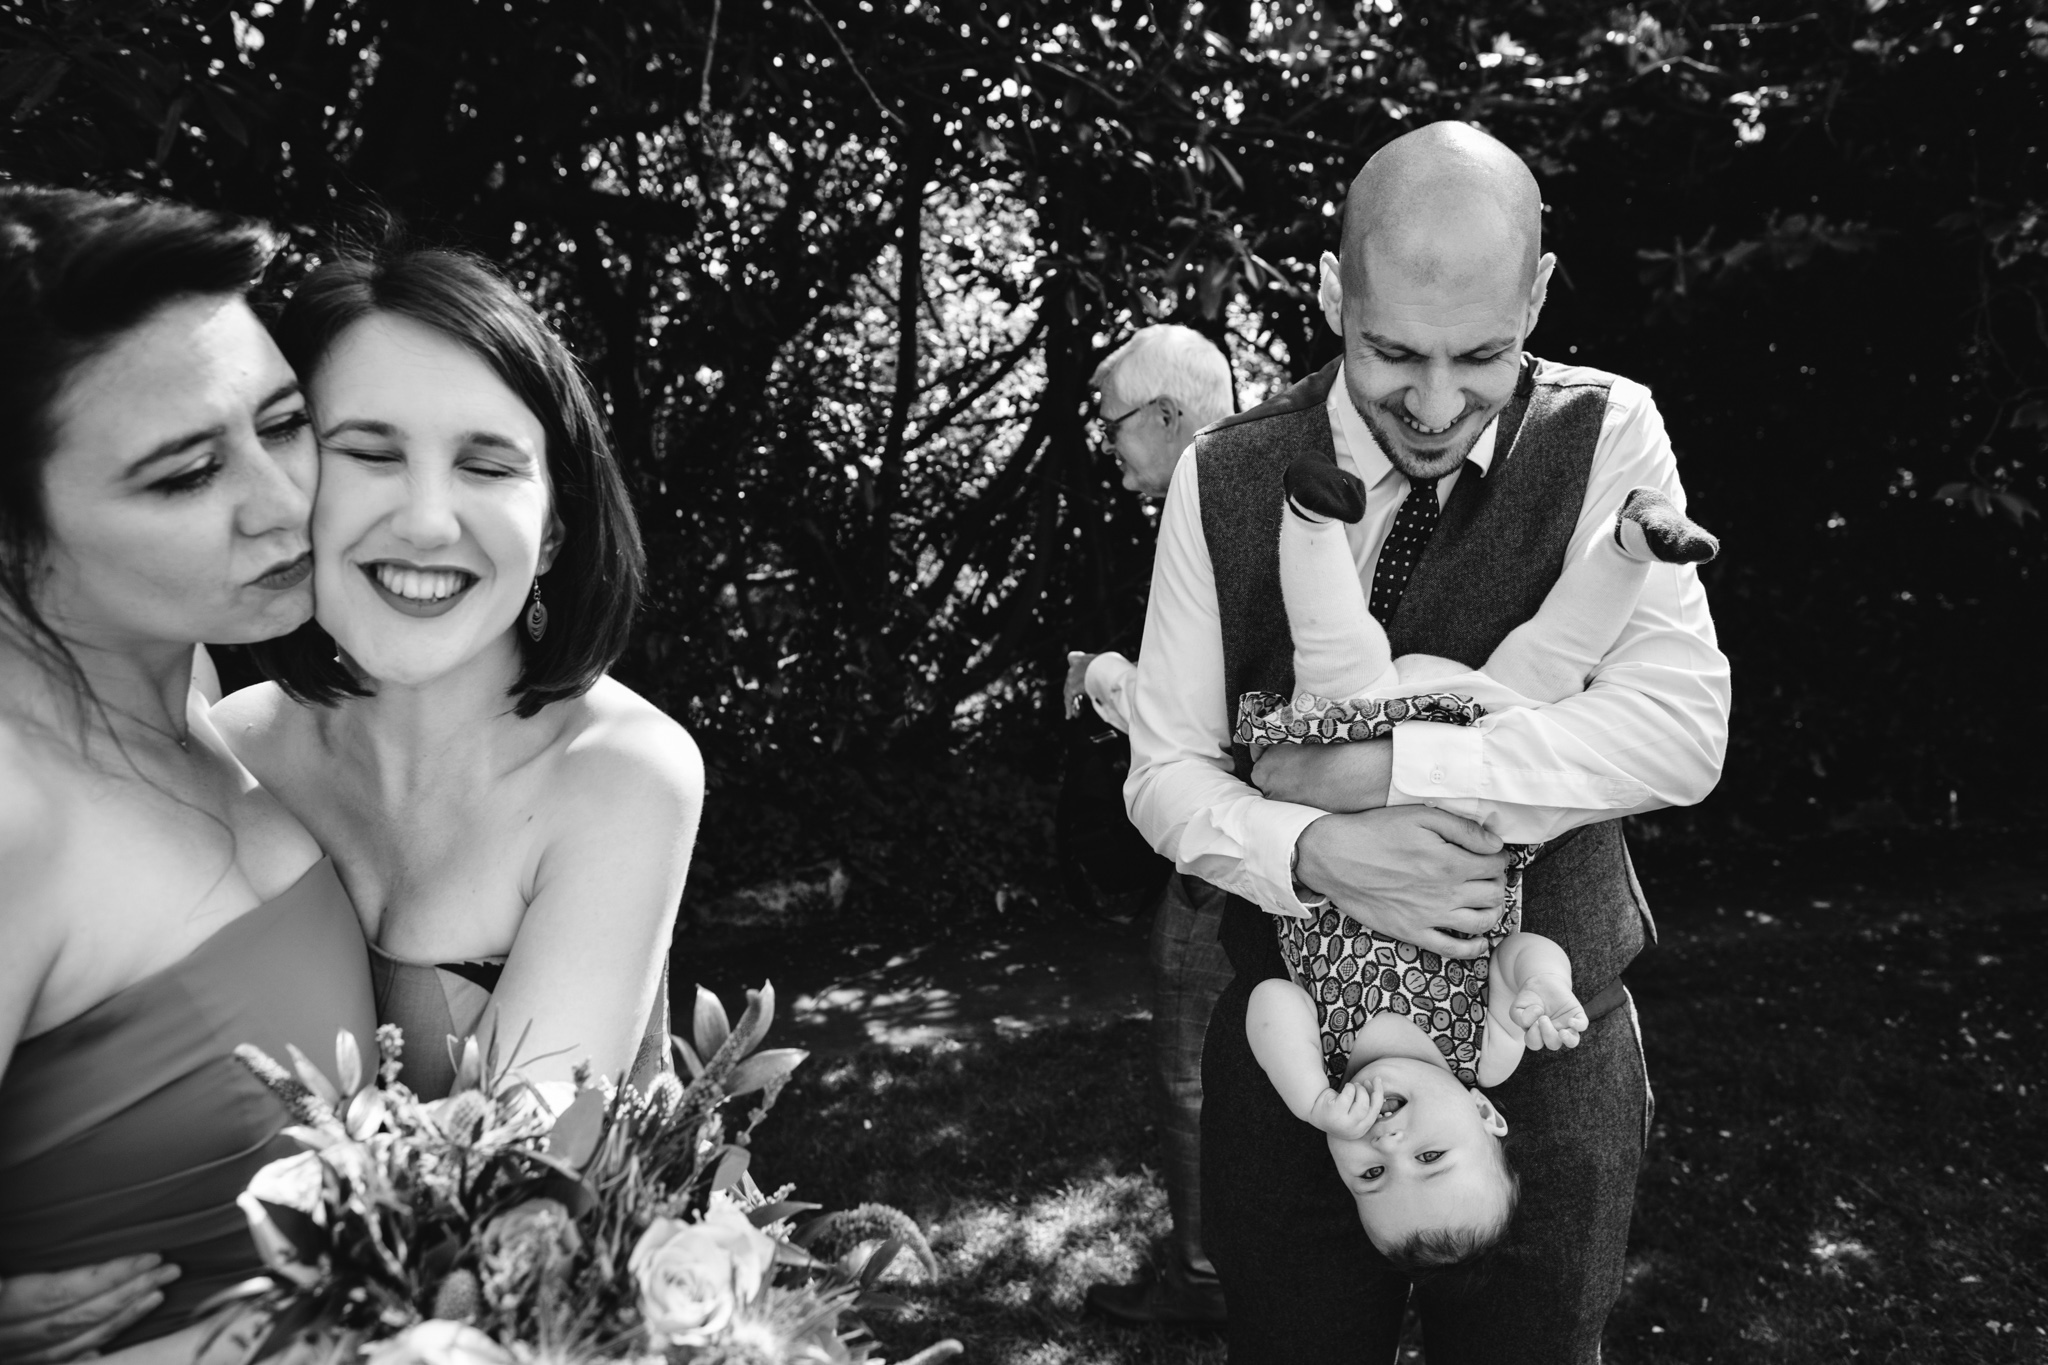 derbyshire-wedding-photographer-videographer-camera-hannah-6.jpg